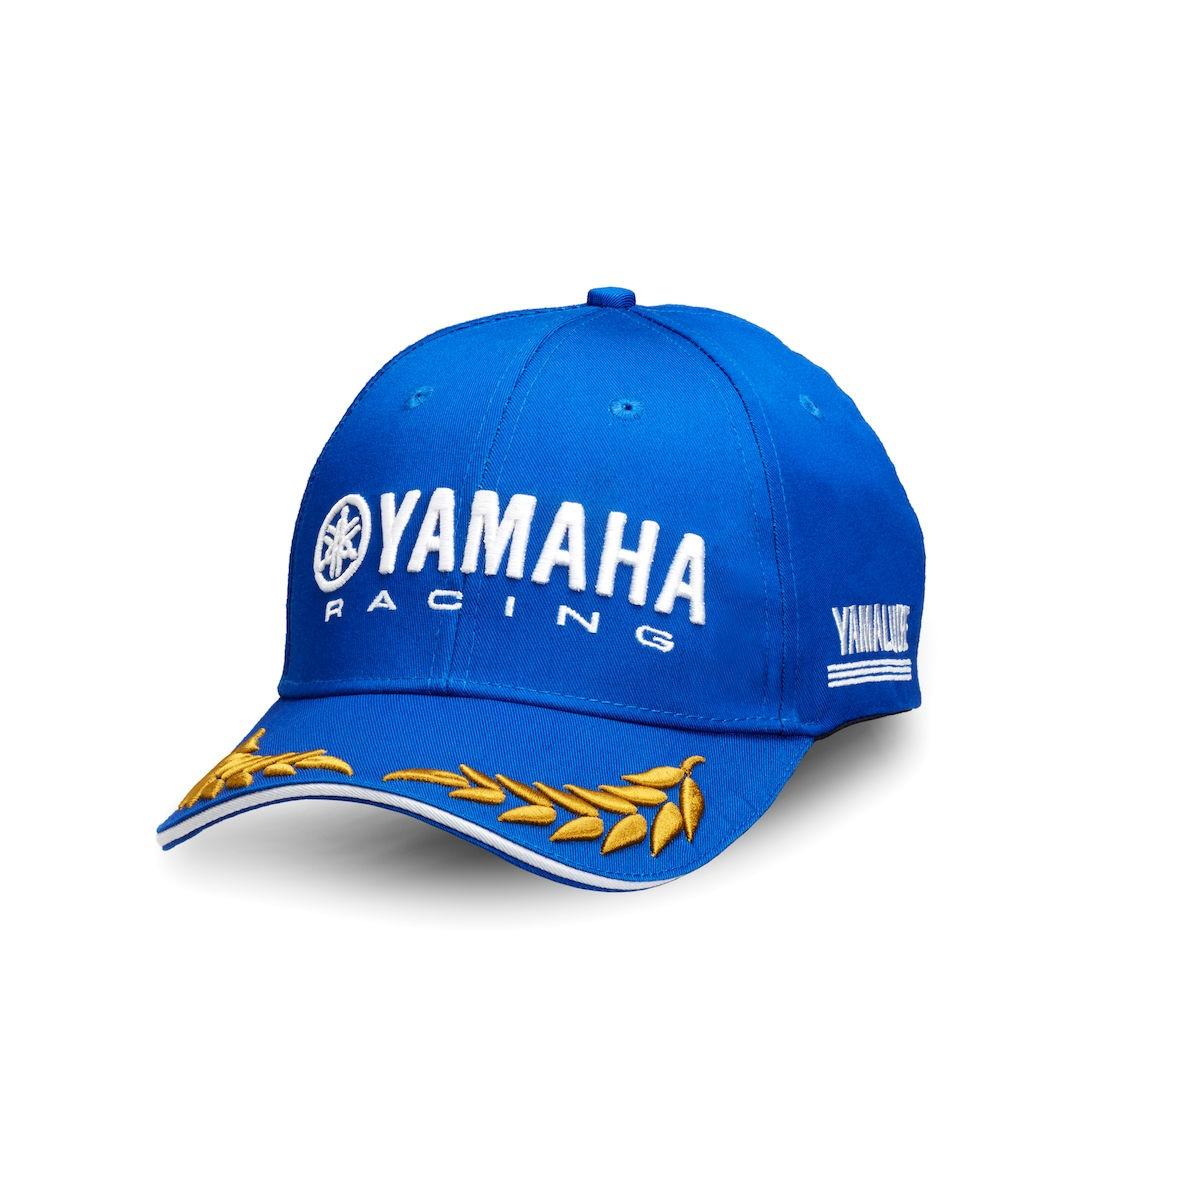 Une casquette Yamaha sinon rien !